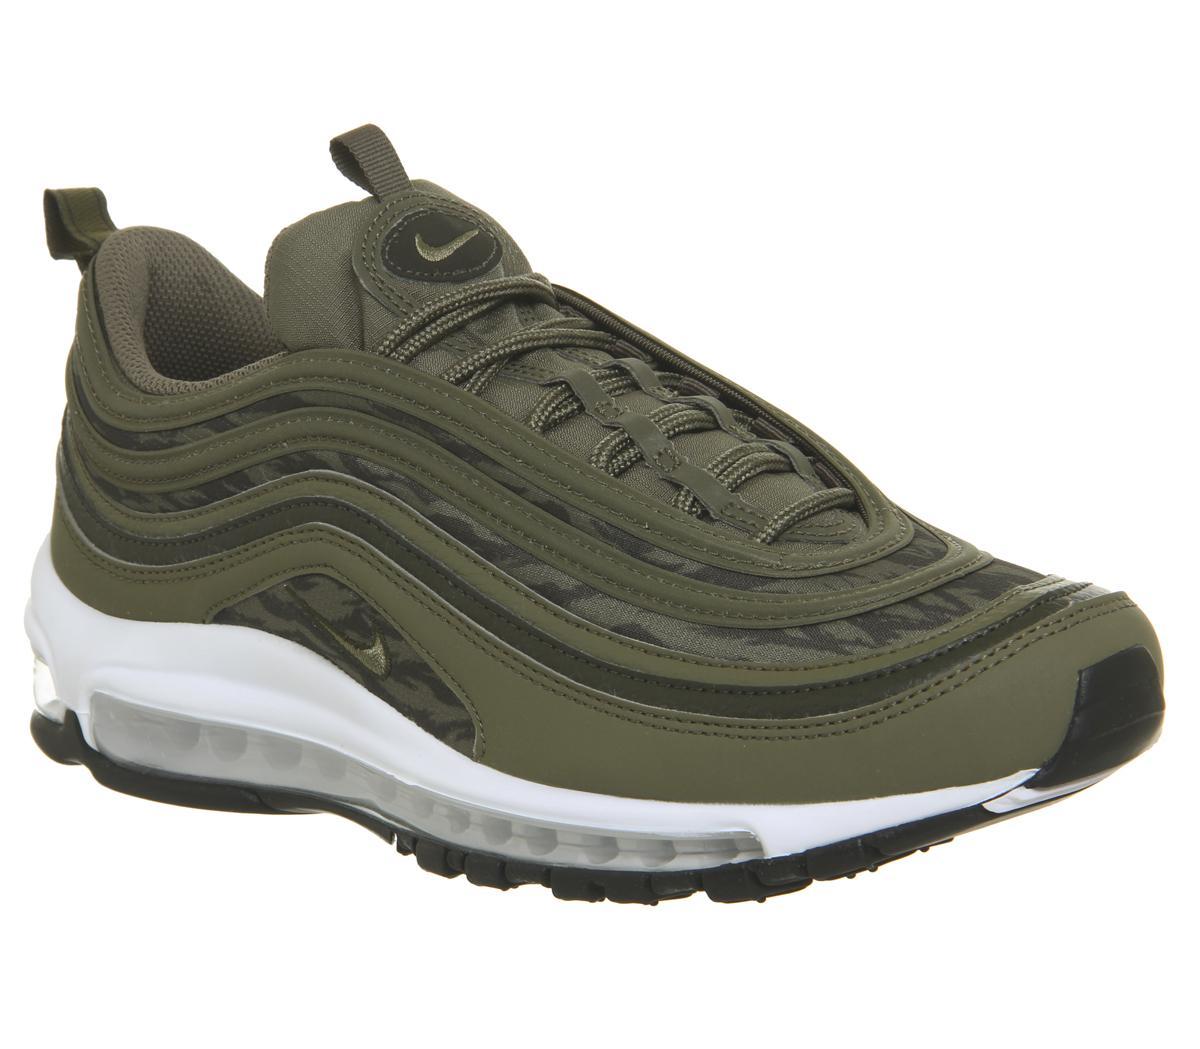 Nike Air Max 97 Medium OliveSequoiaNeutral Olive Trainers